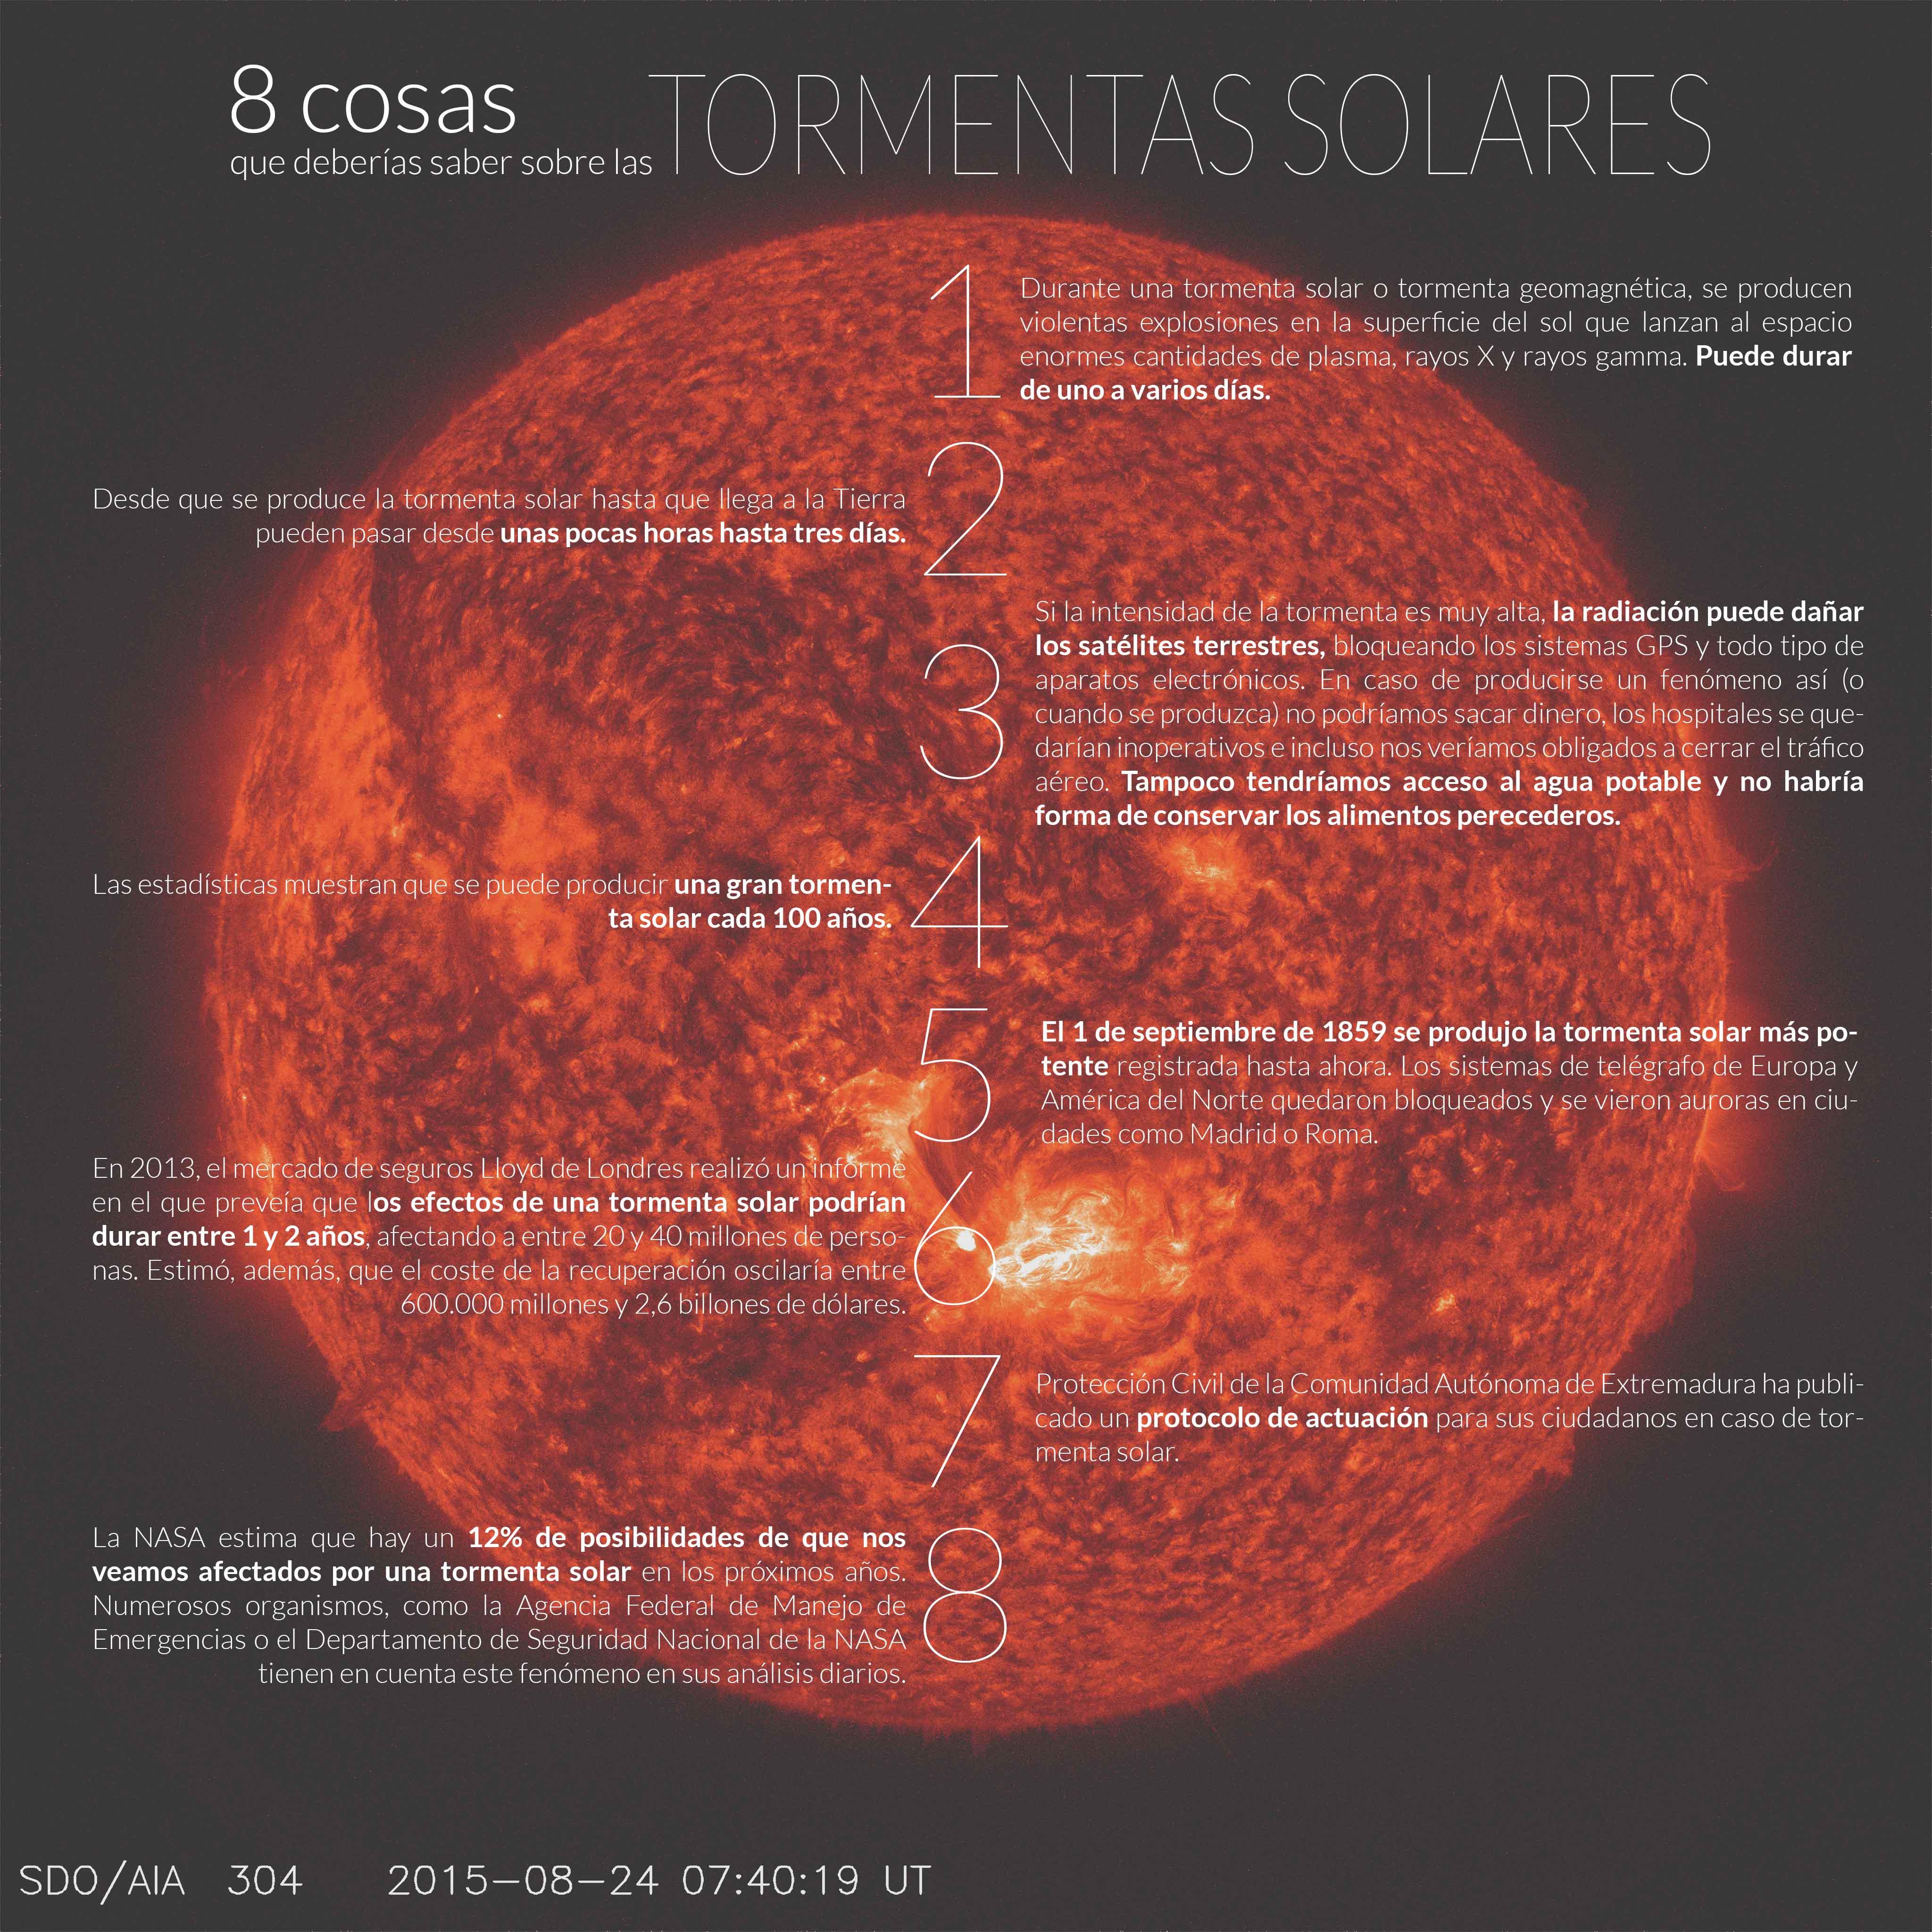 8 cosas tormenta solares